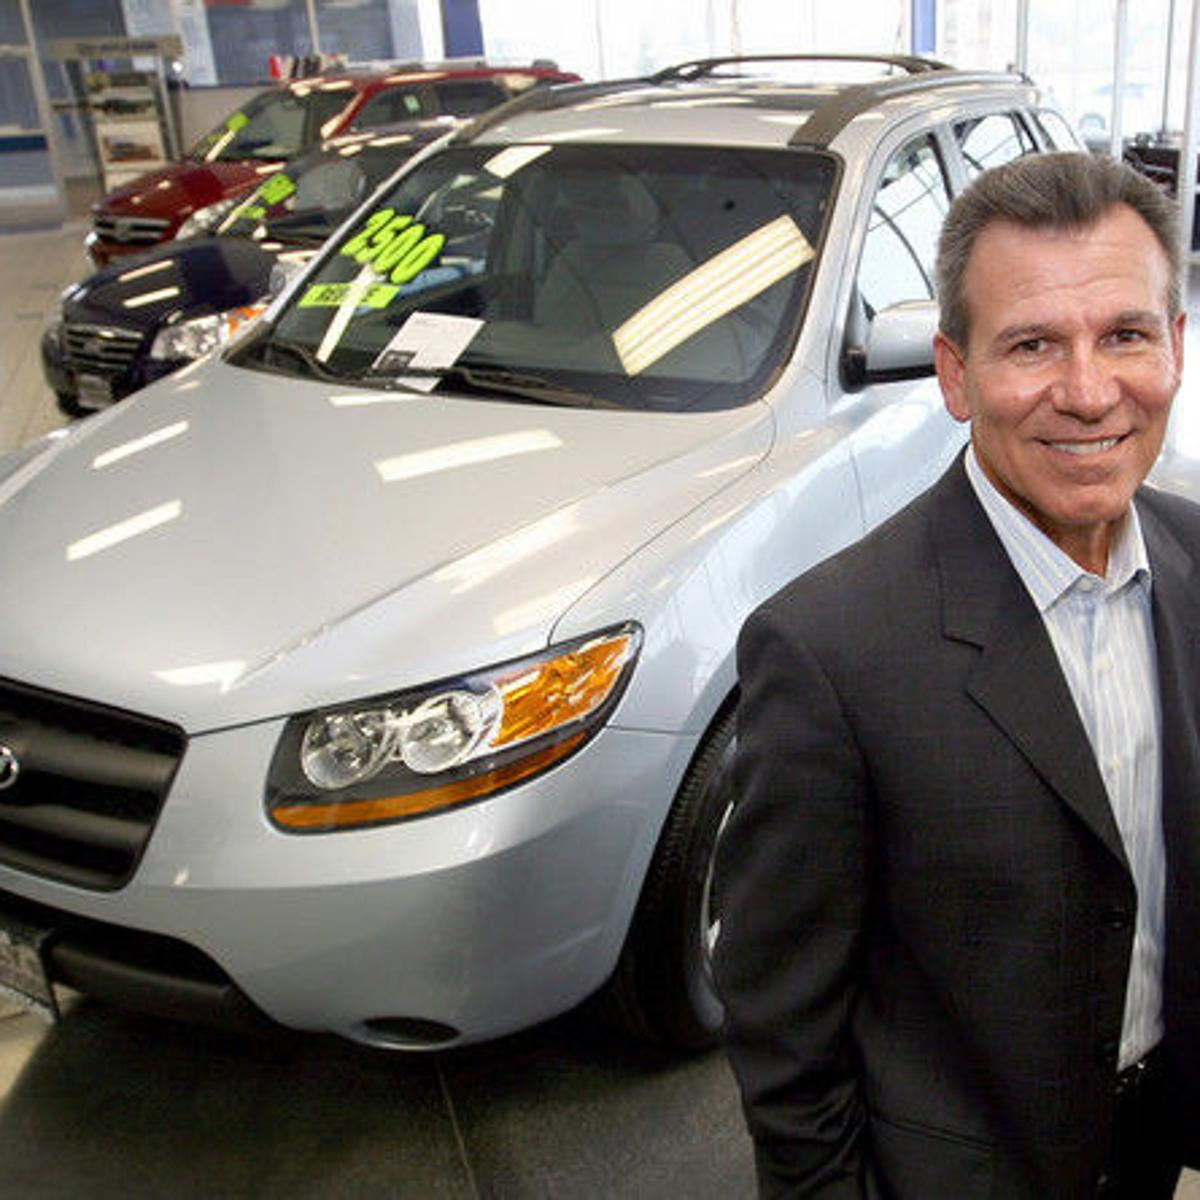 Delano Car Dealers >> Local Car Dealer Jose Arredondo Is Killed News Bakersfield Com